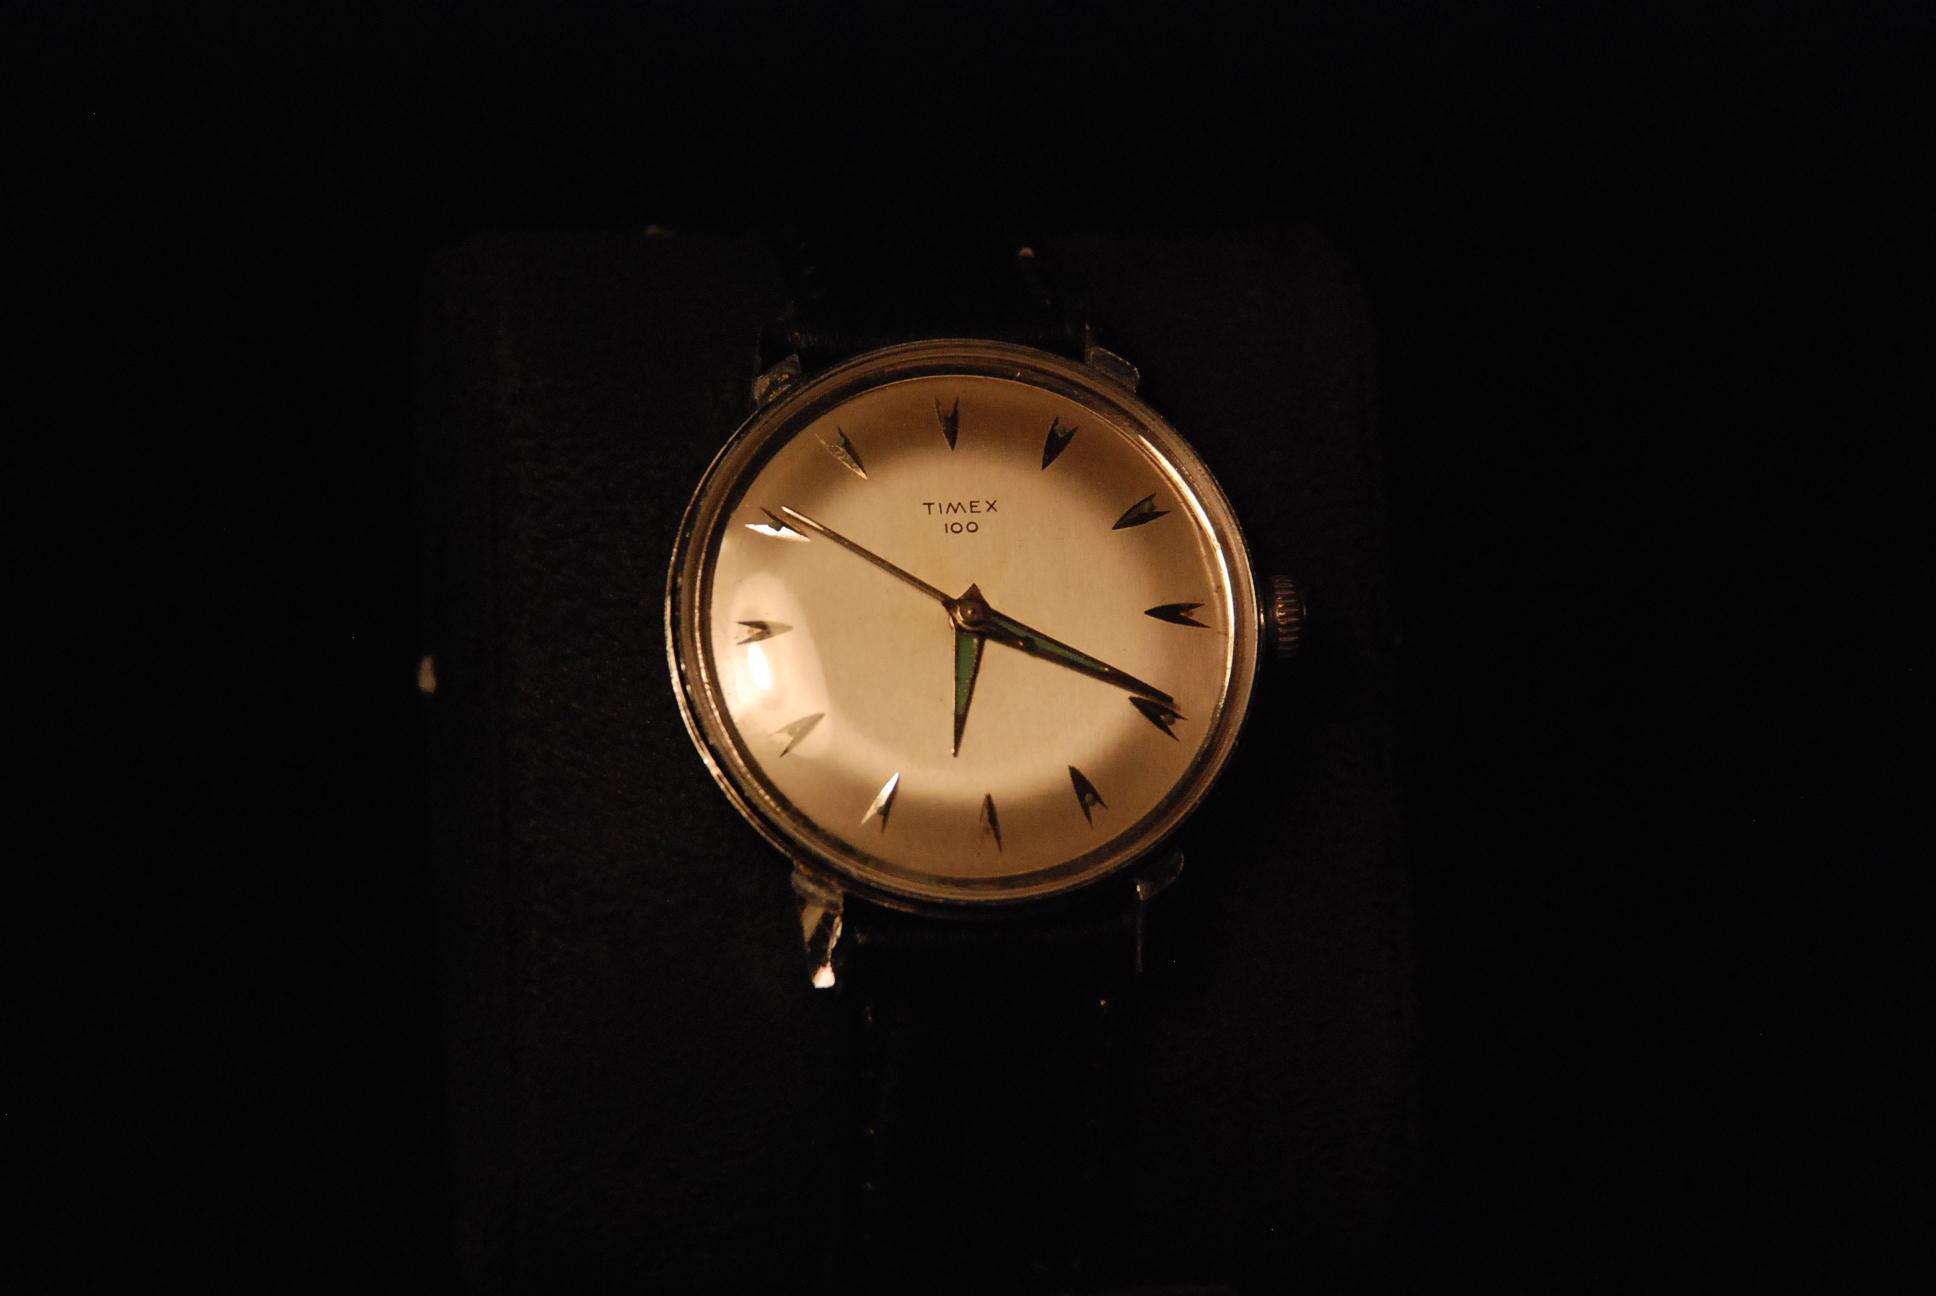 Timex 100 1